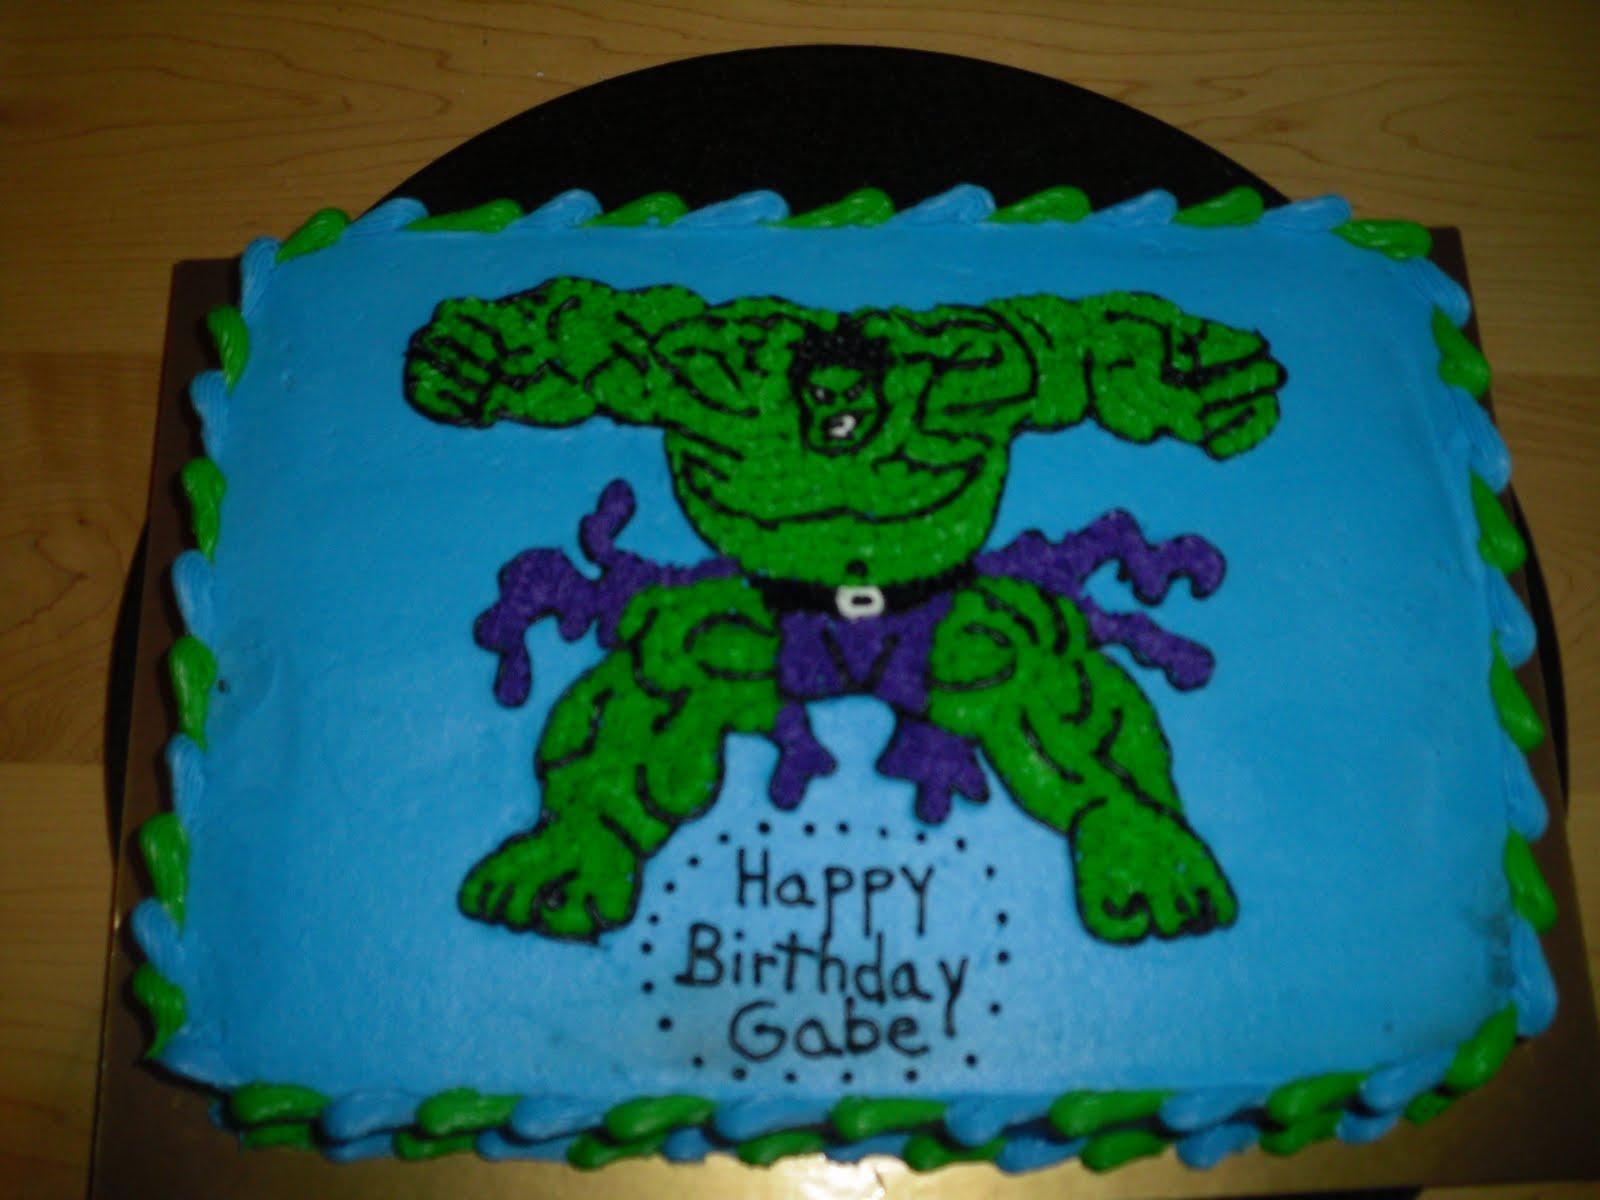 Cake Design Hulk : Cake Designs by Steph: Incredible Hulk cake!